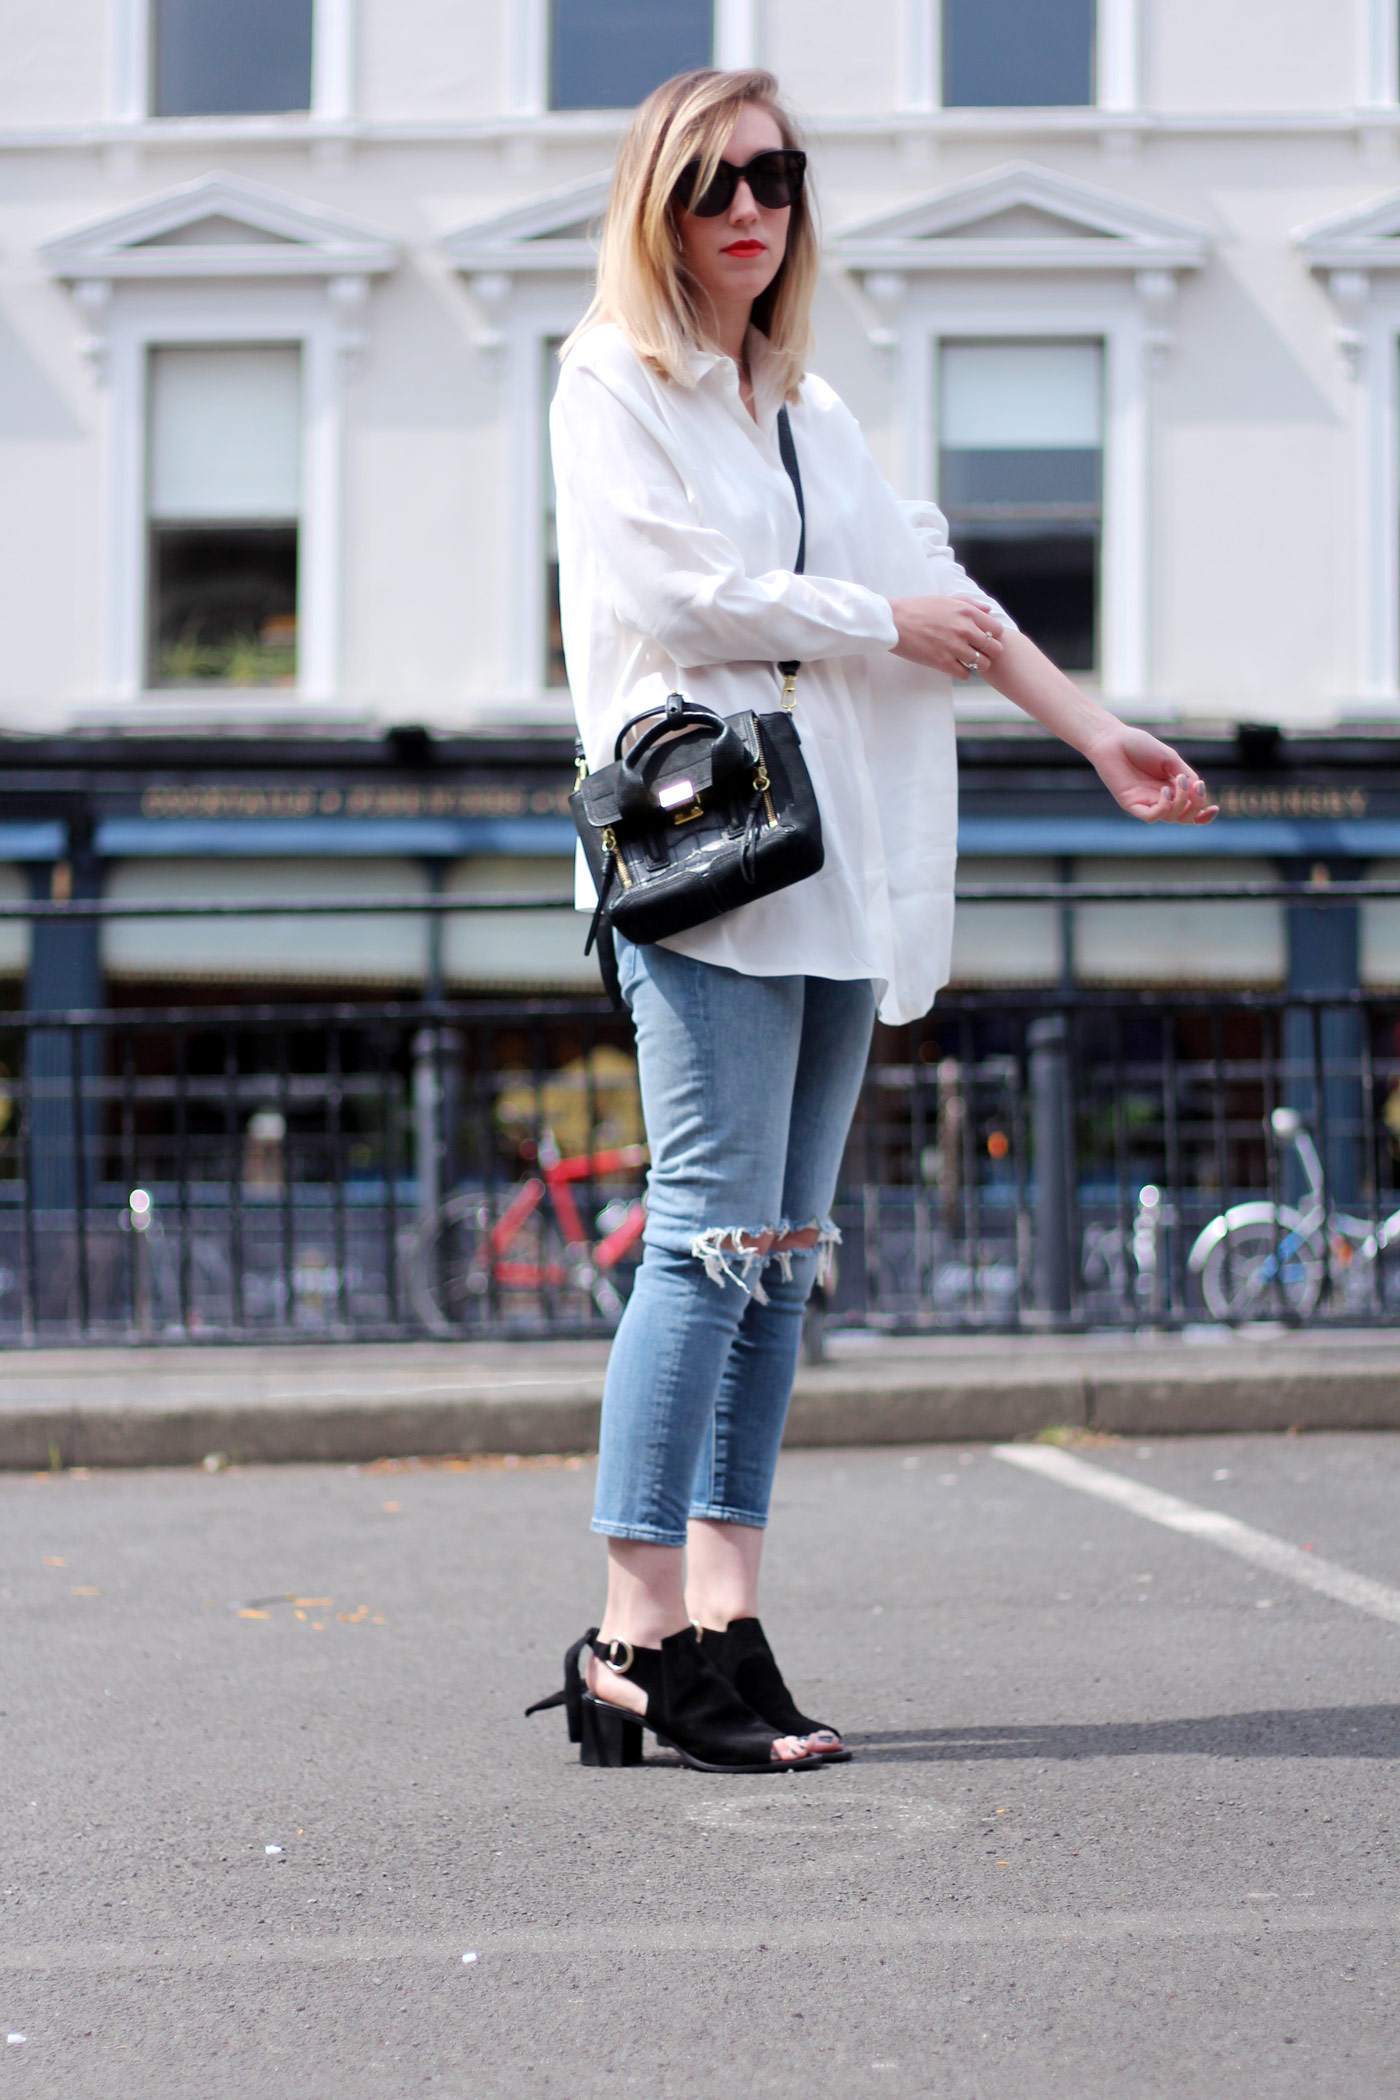 kurt-geiger-suede-peep-toe-boots-7FAM-jeans-COS-white-shirt-phillip-lim-pashli-mini